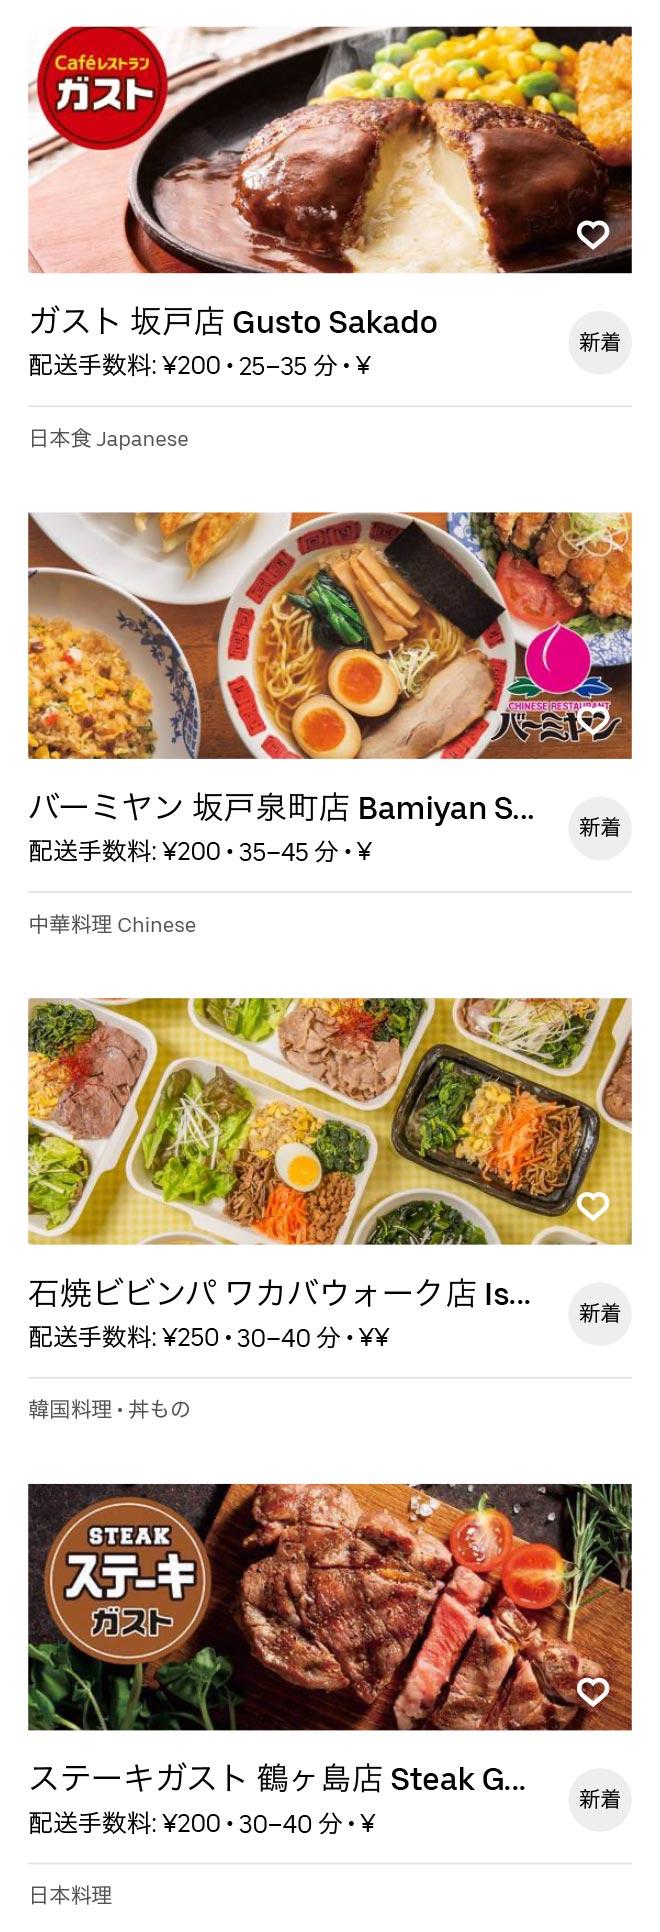 Sakado menu 2010 03